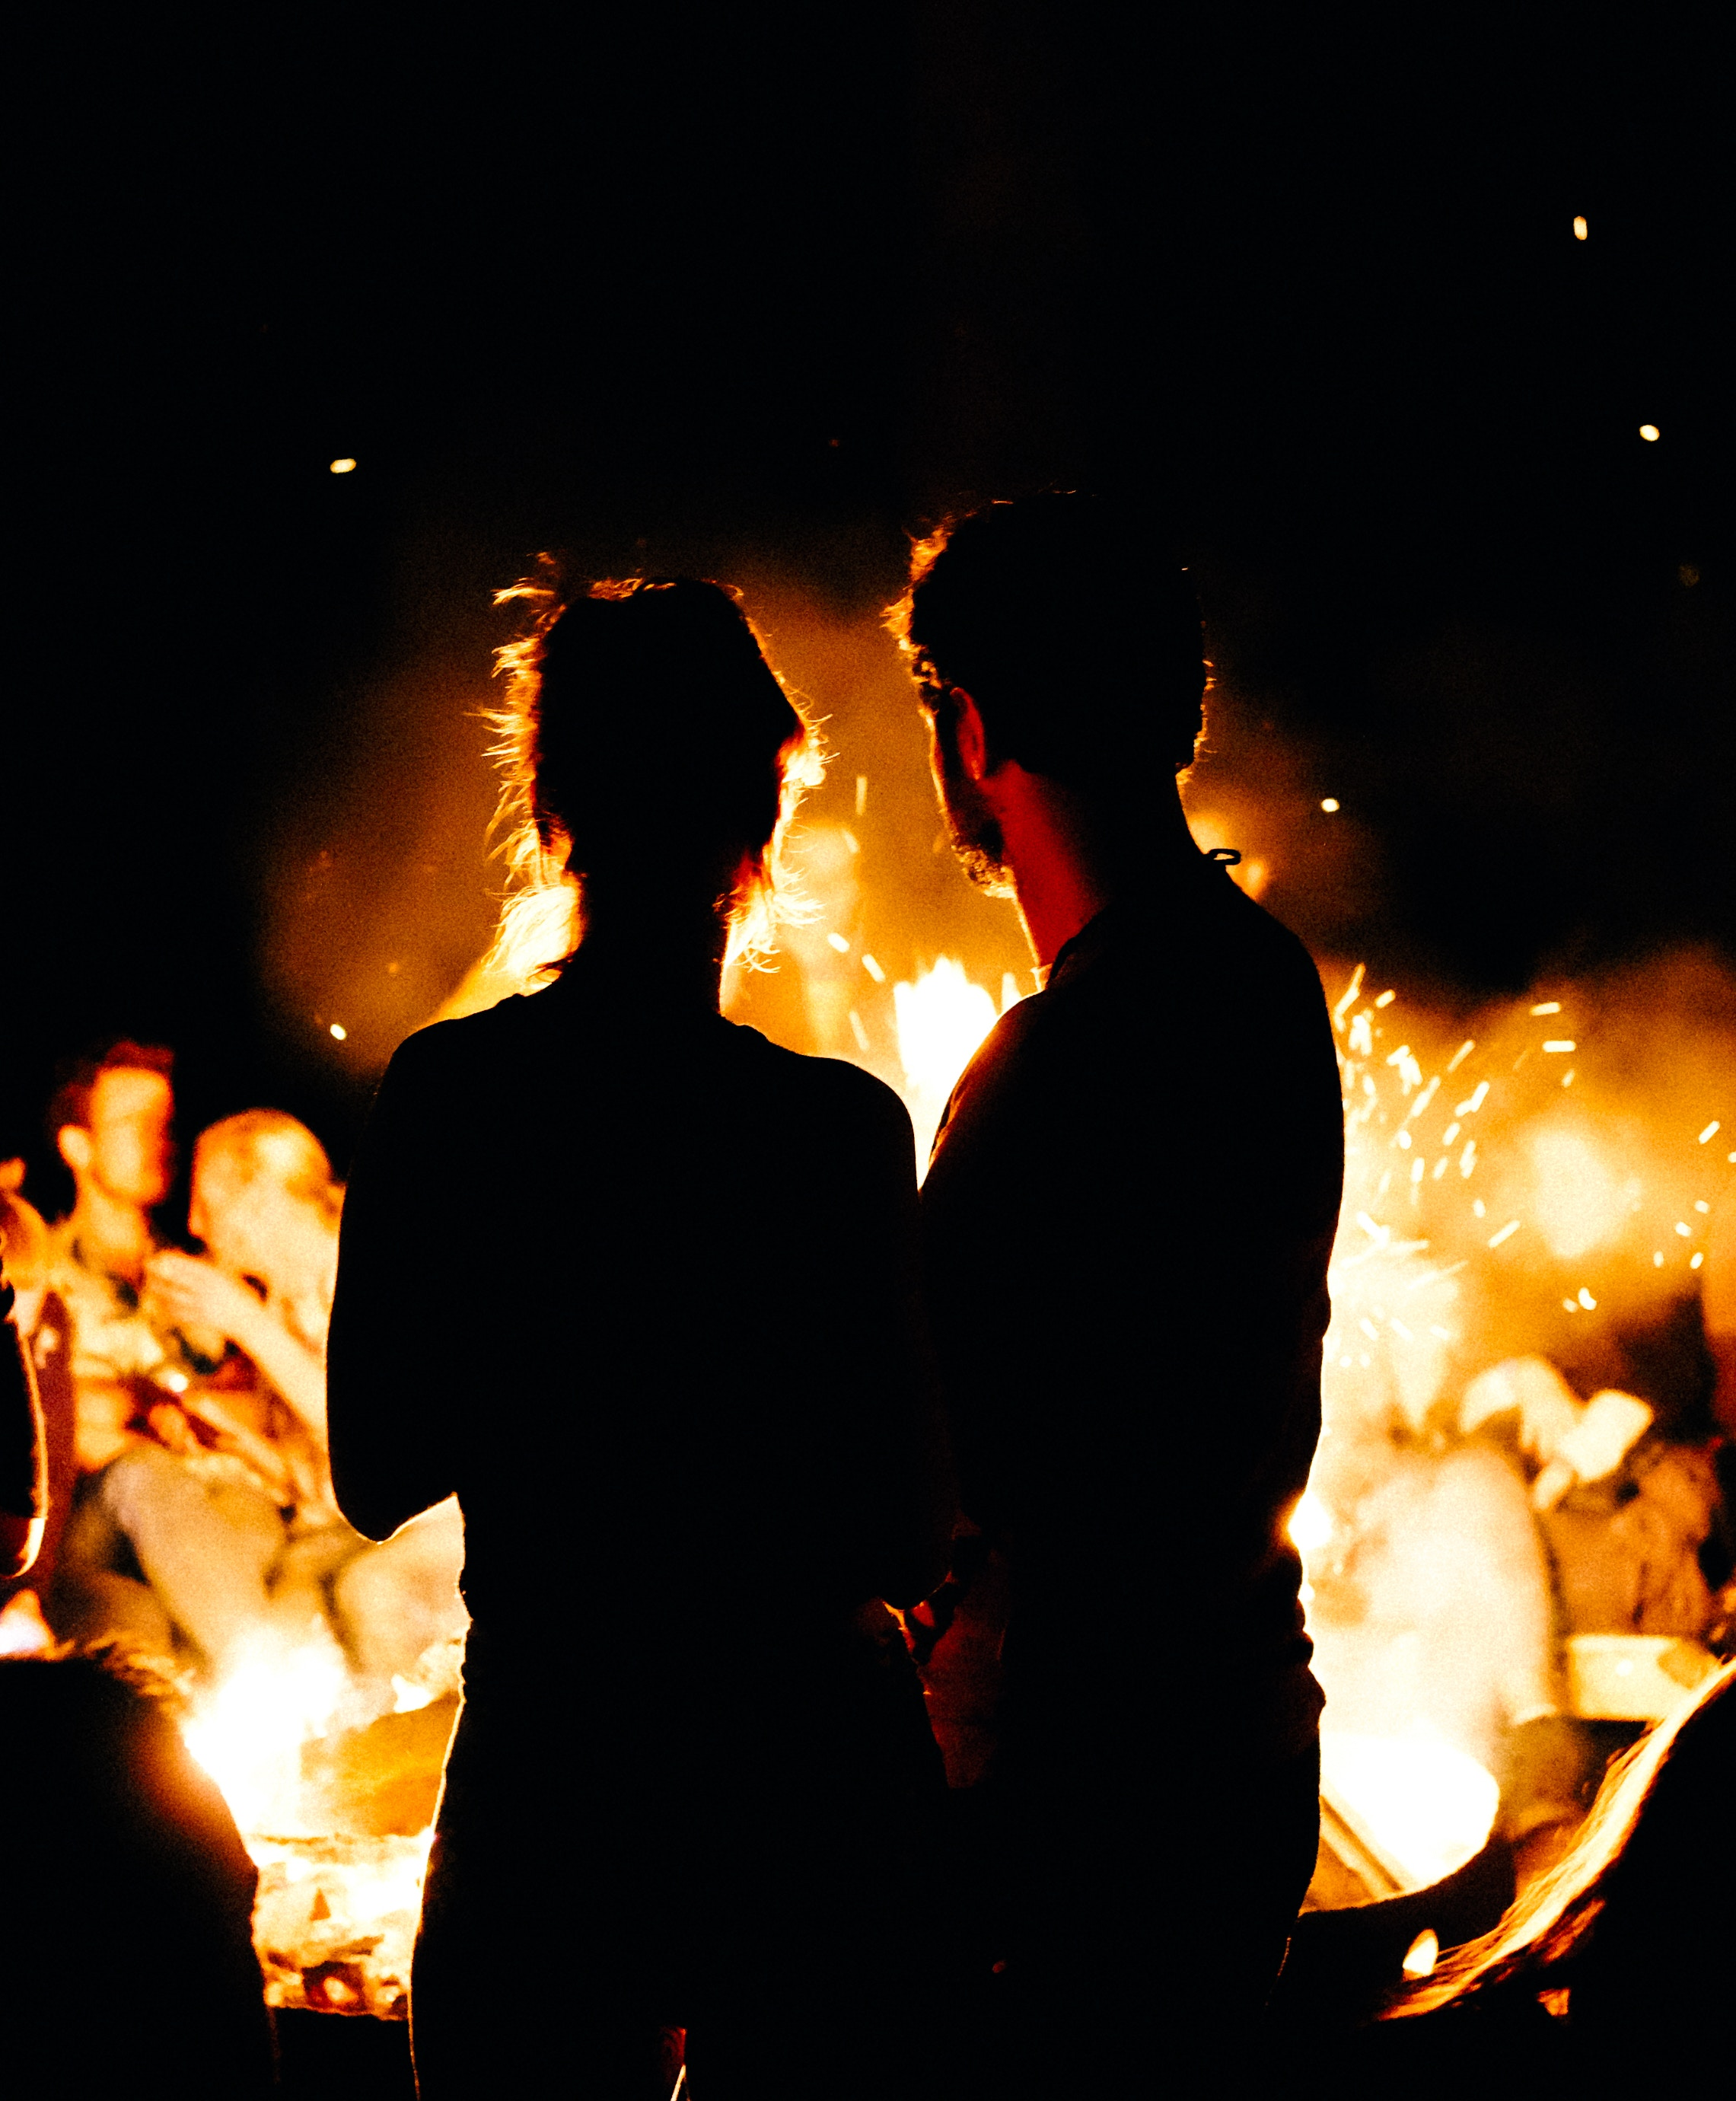 couple-fire-flames-passion-wesley-balten-272877-unsplash.jpg